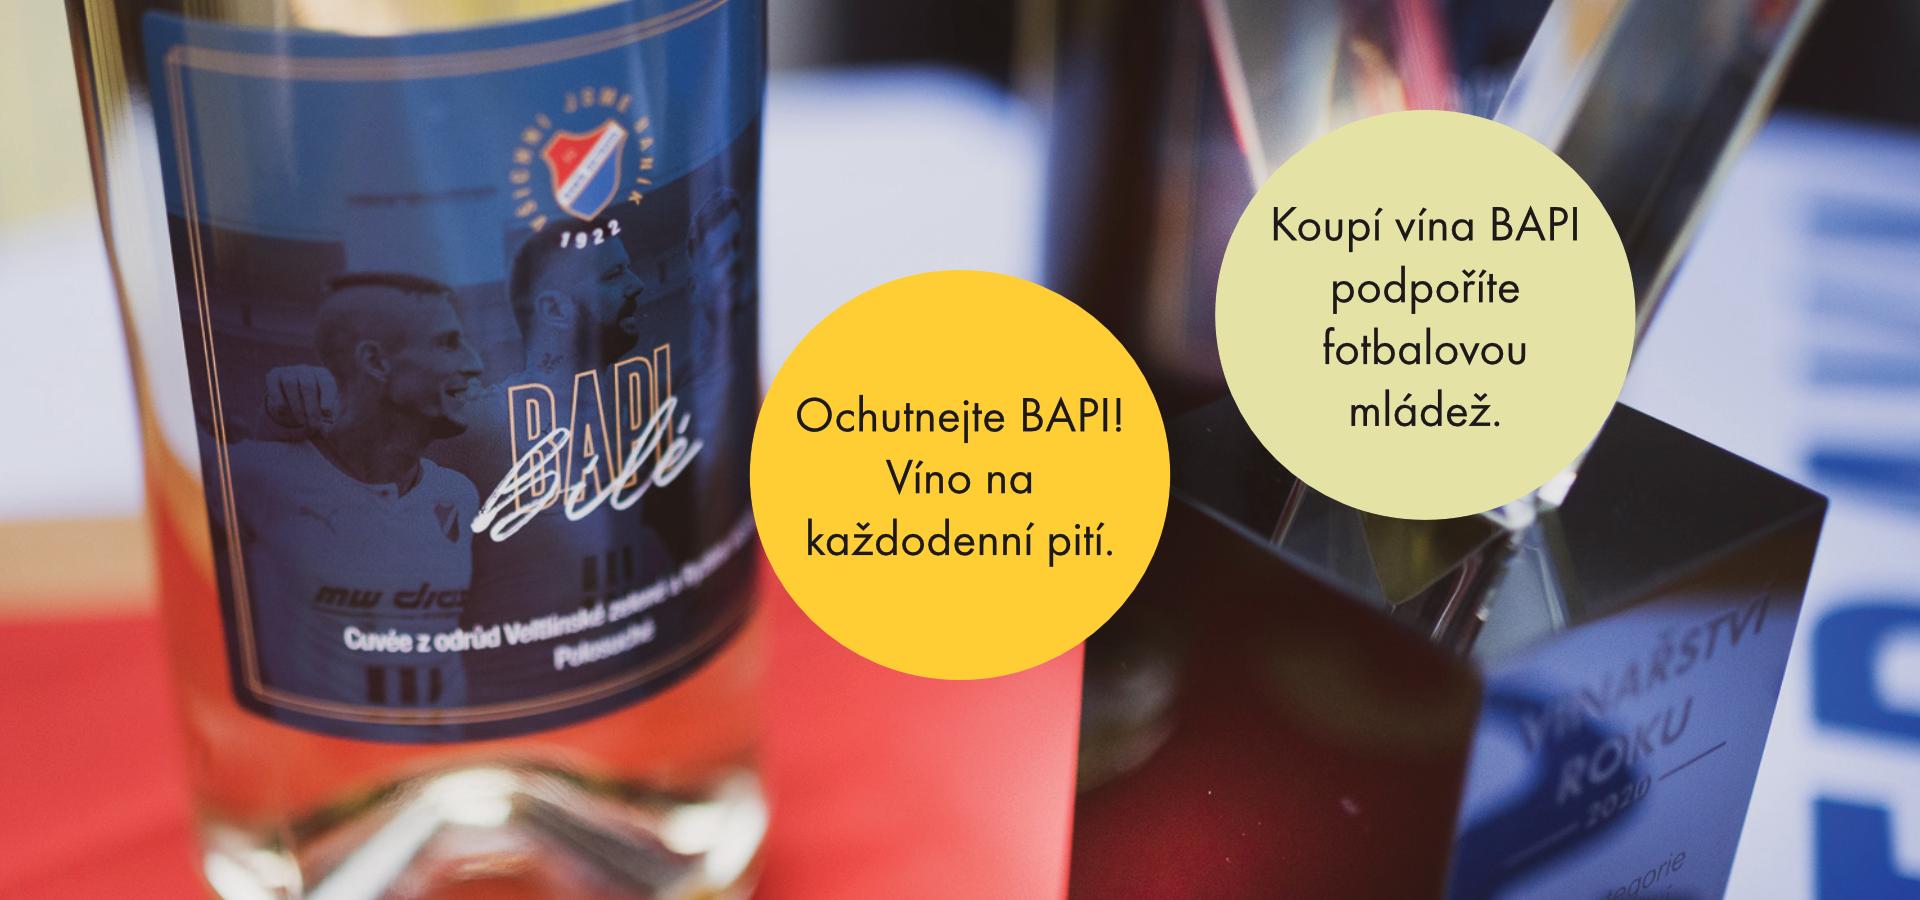 BAPI - Víno FC Baník Ostrava